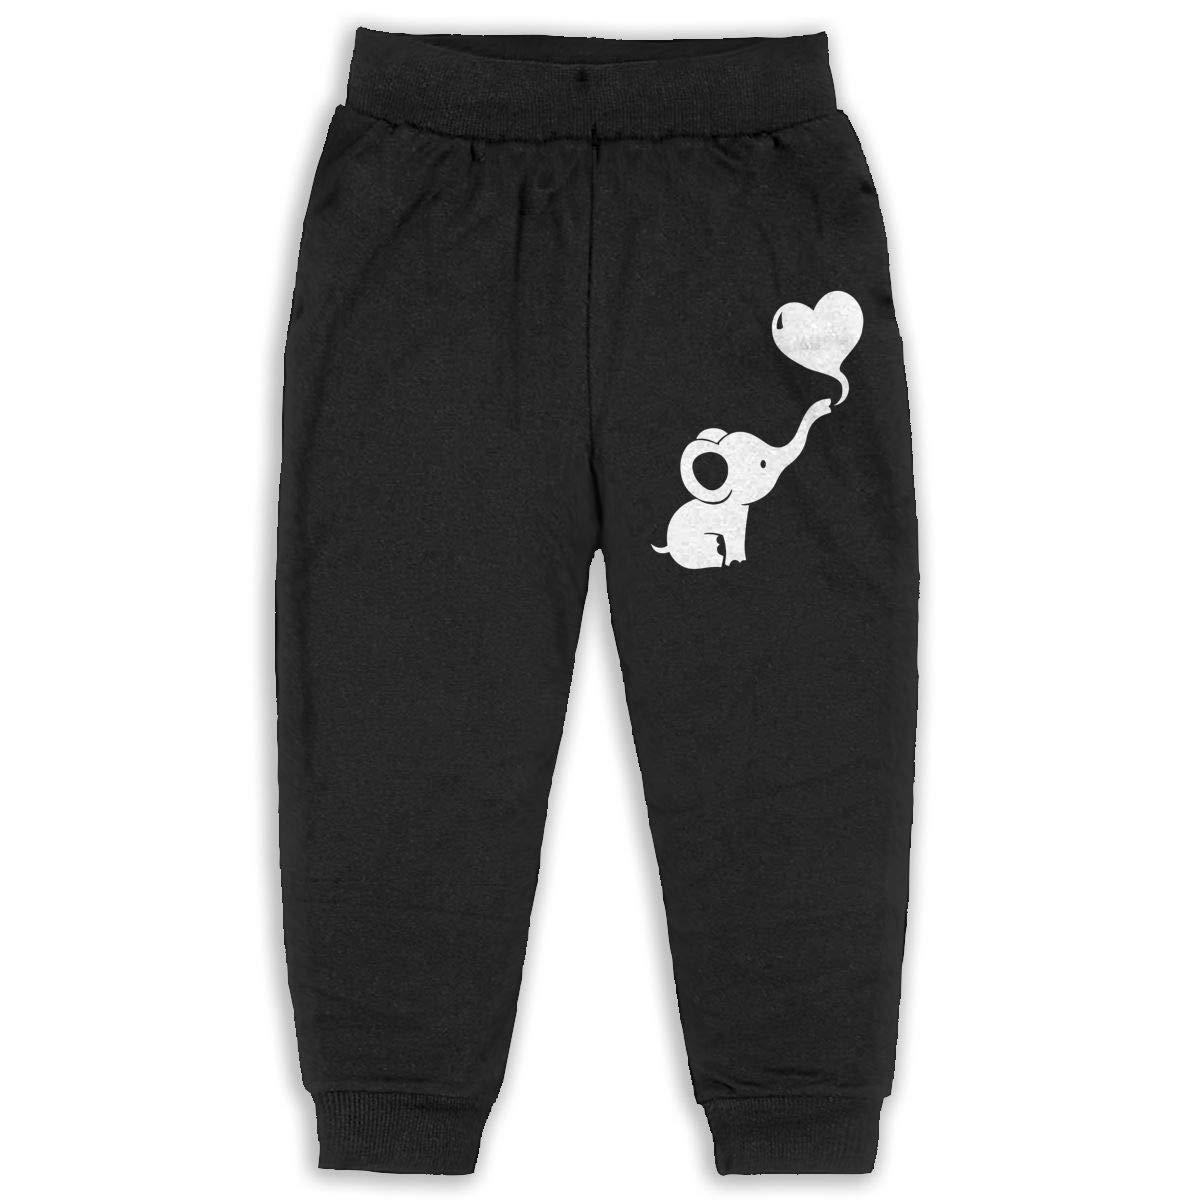 Child GHYNJUM Baby Elephant Dumbo Heart Cute Unisex 2-6T Autumn Winter Cotton Fashion Pants